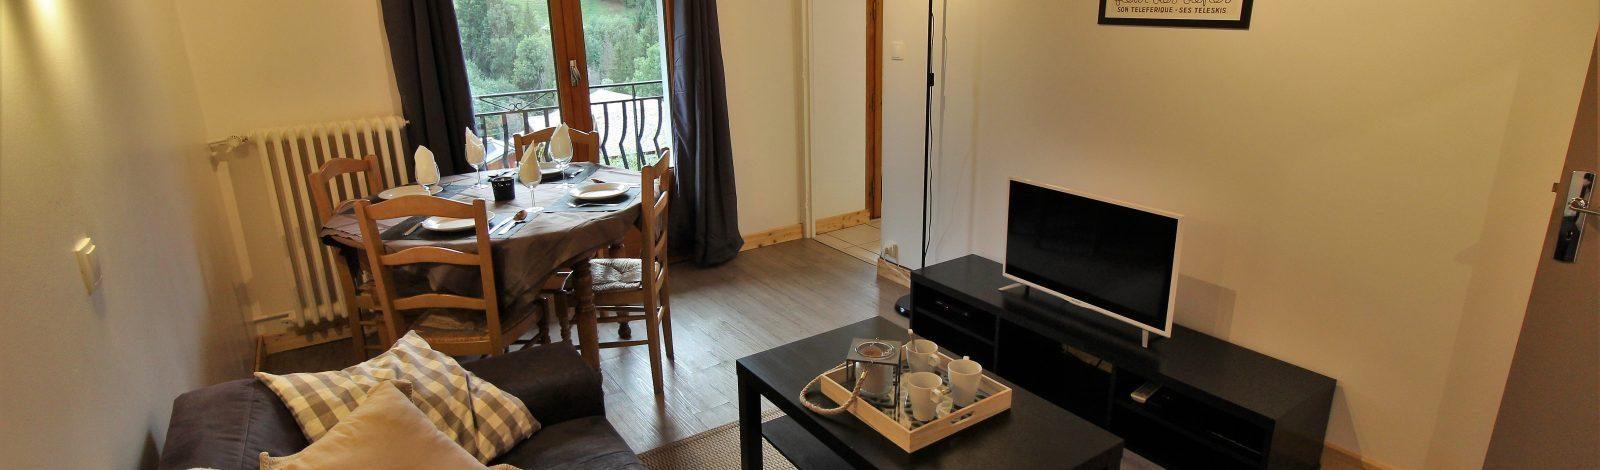 Apartment Jardin Banner 001